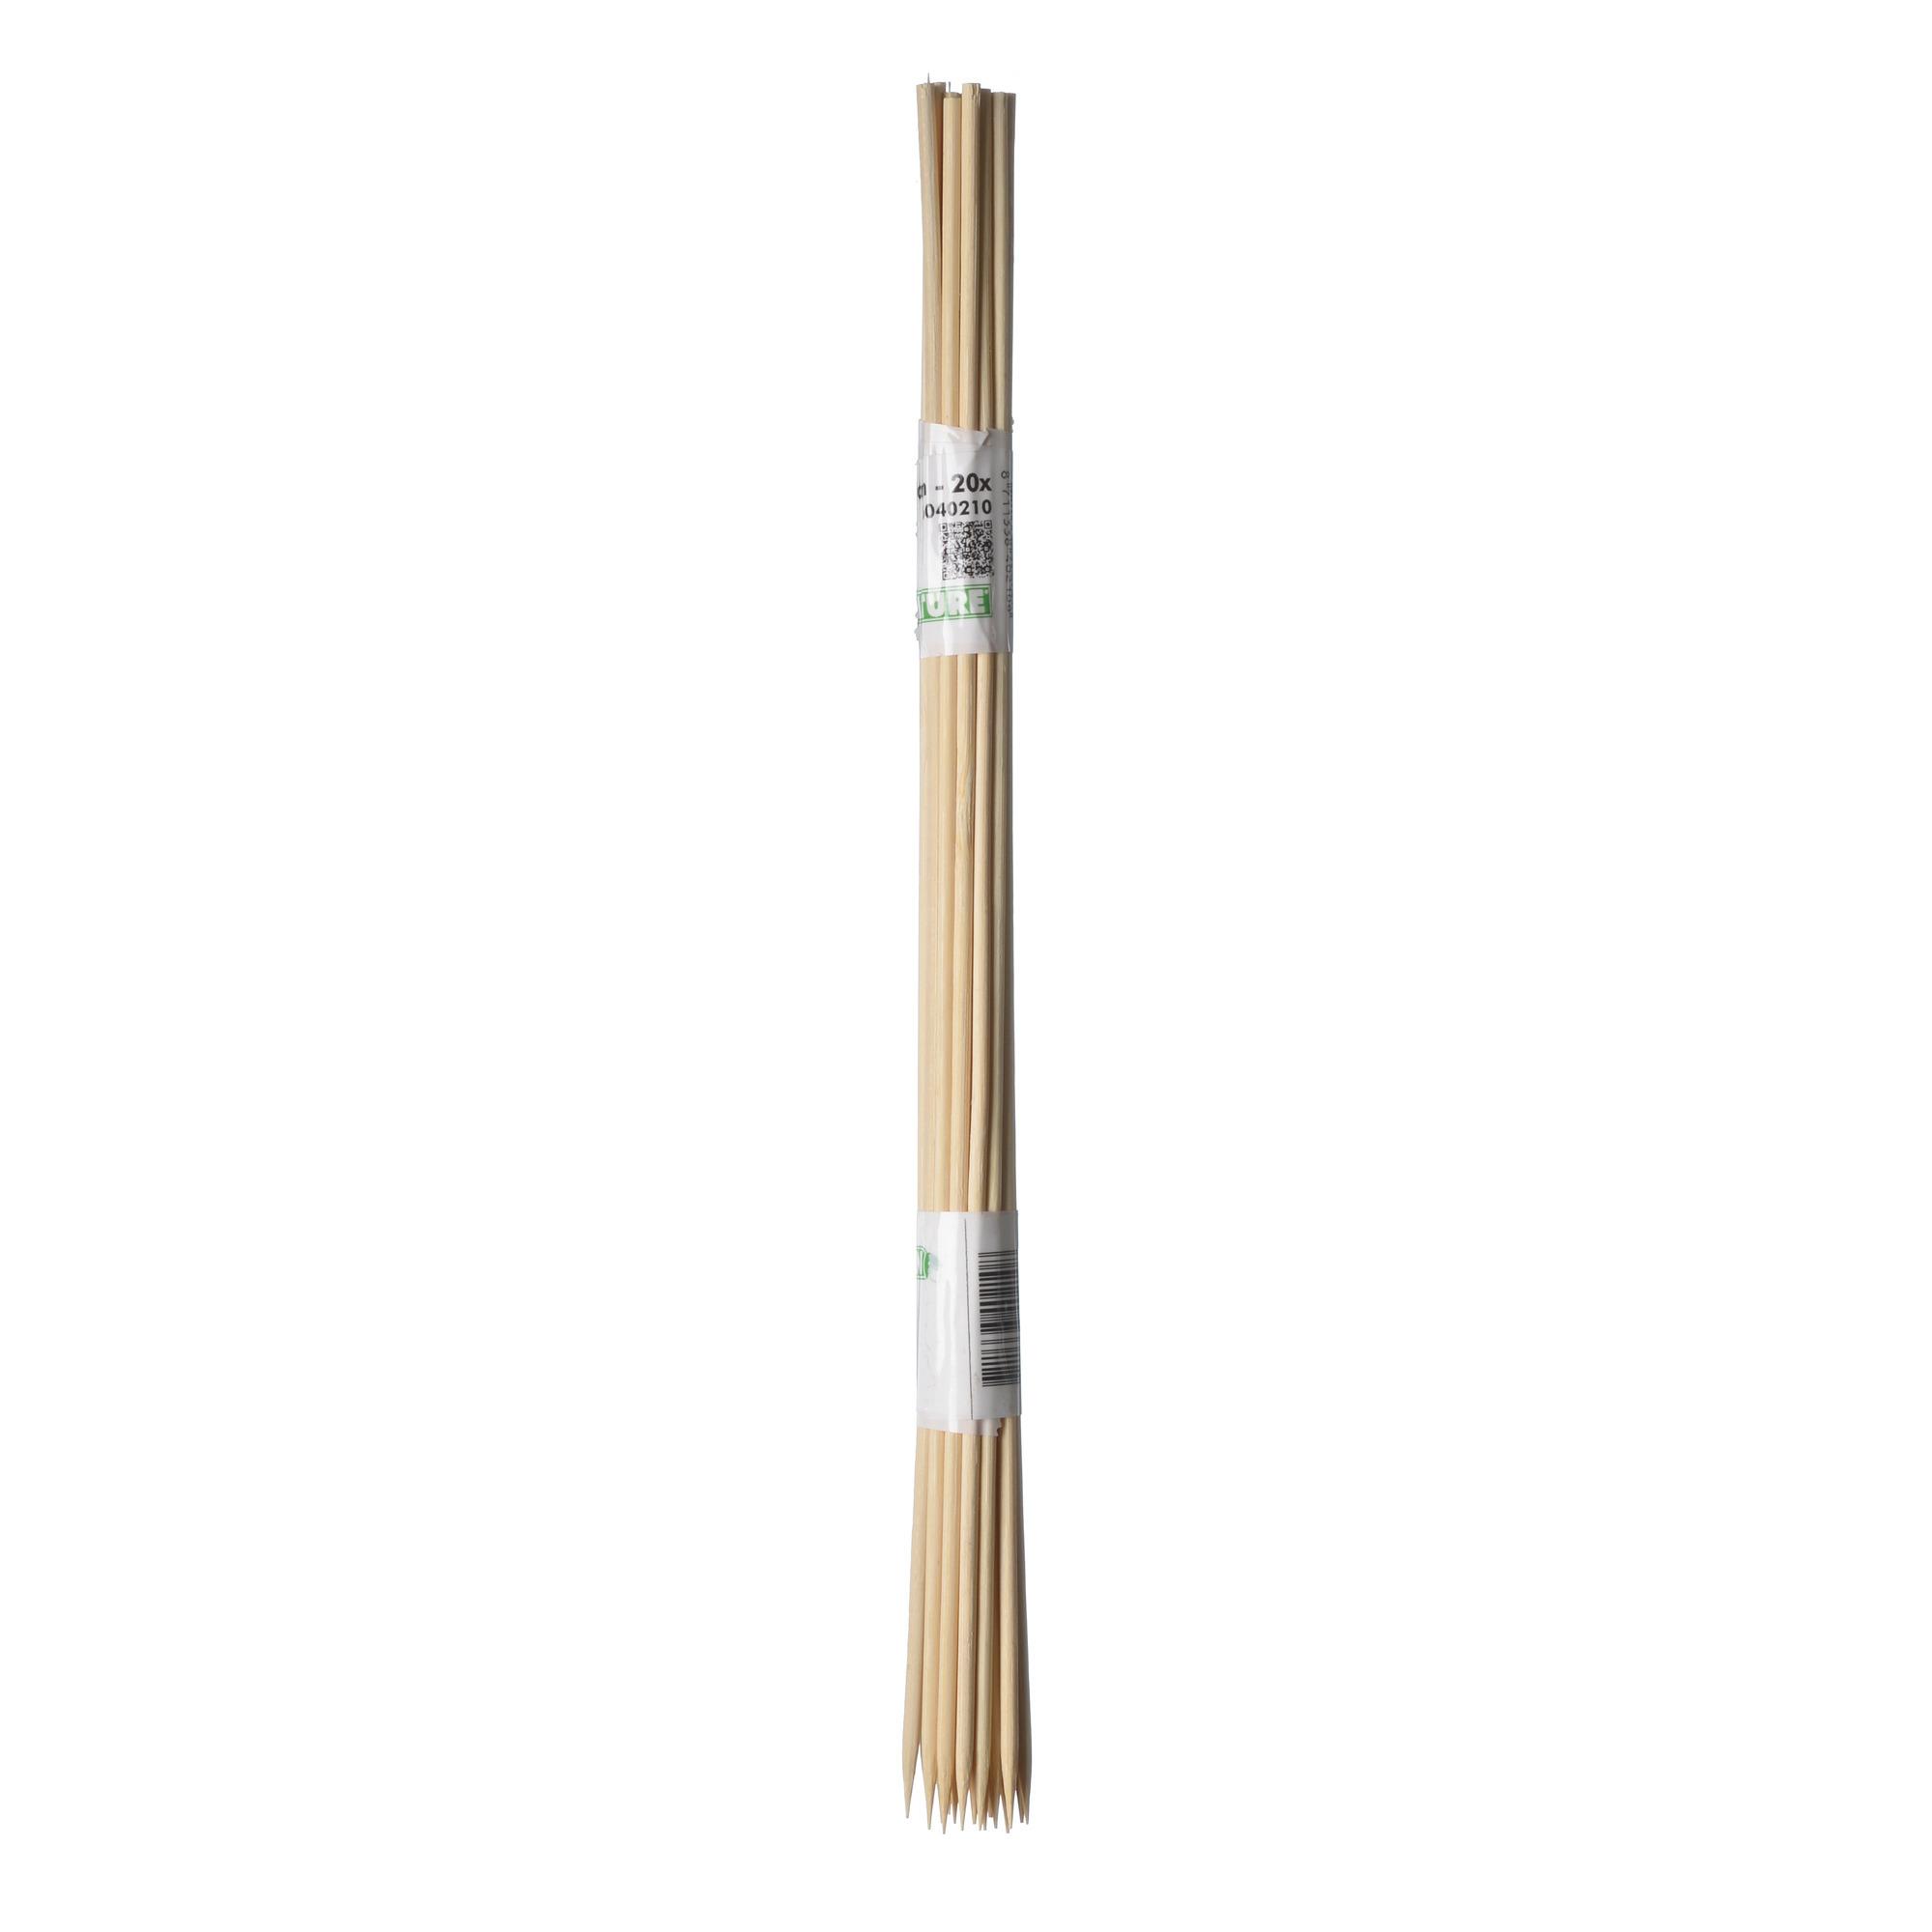 10x stuks splitbamboe / bamboestokjes 50 cm - plantensteun / tonkinstokken -